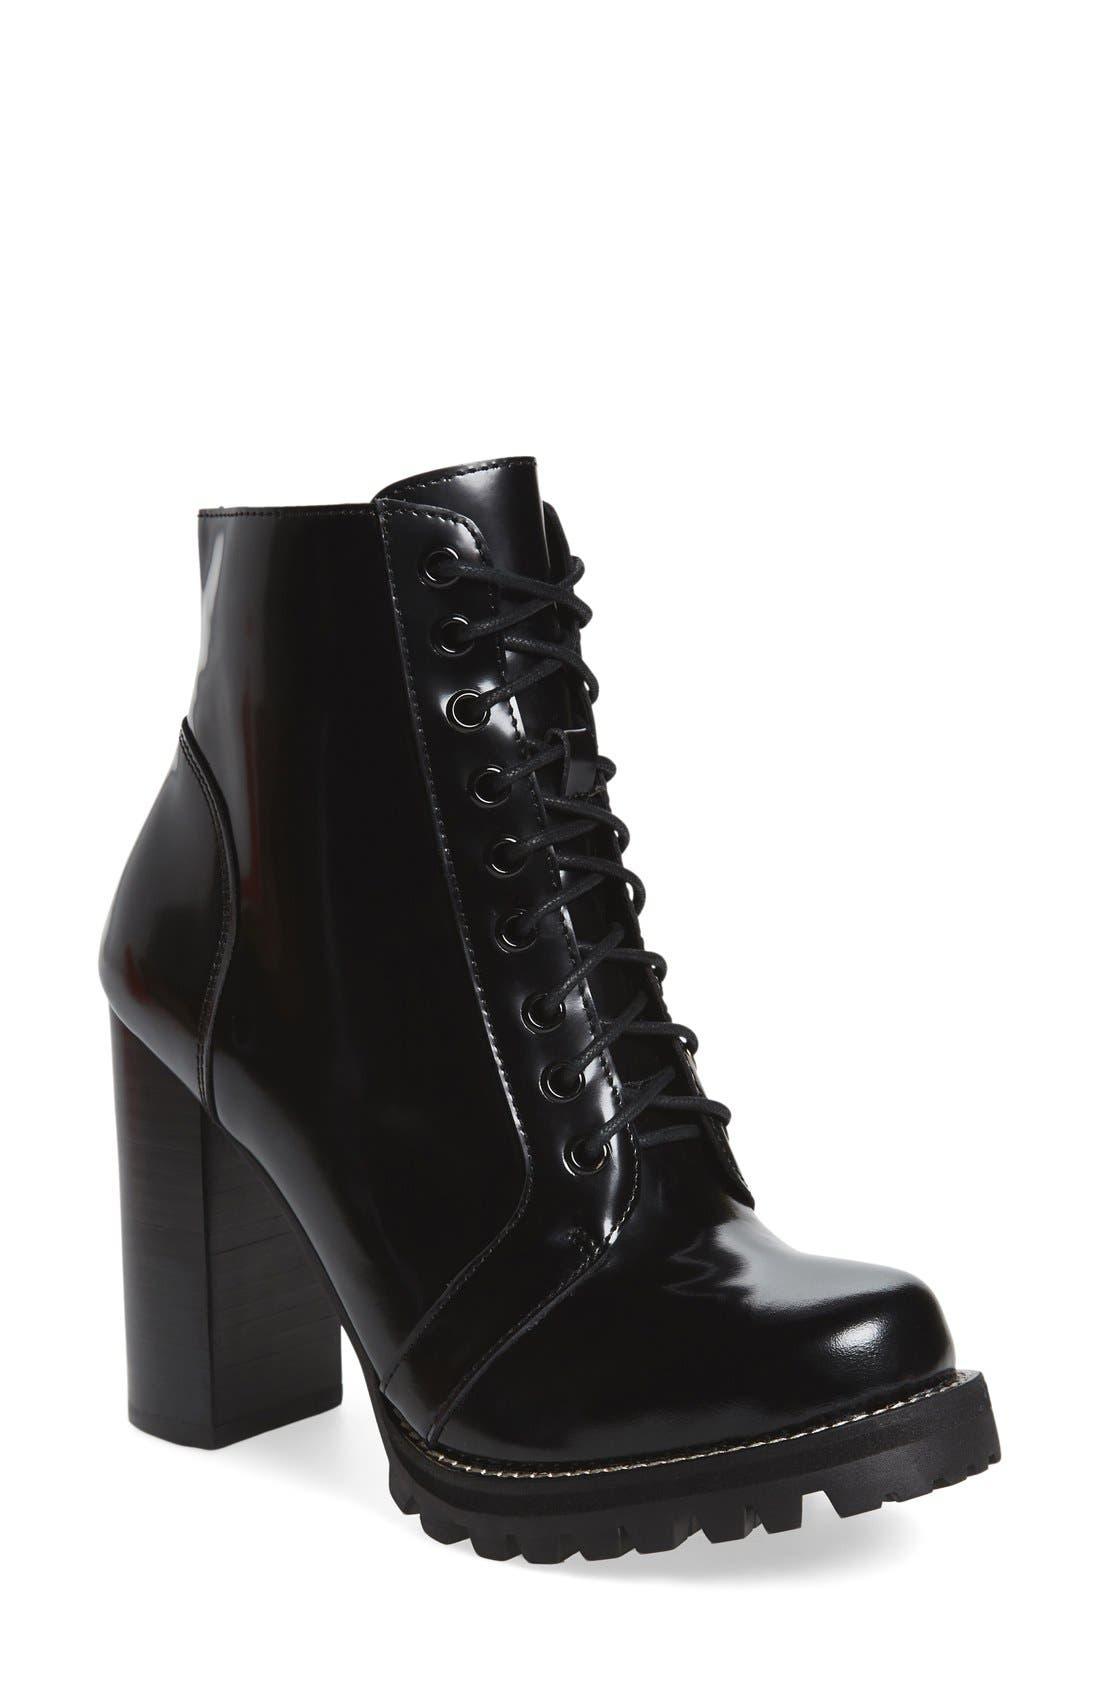 High heel boots pics